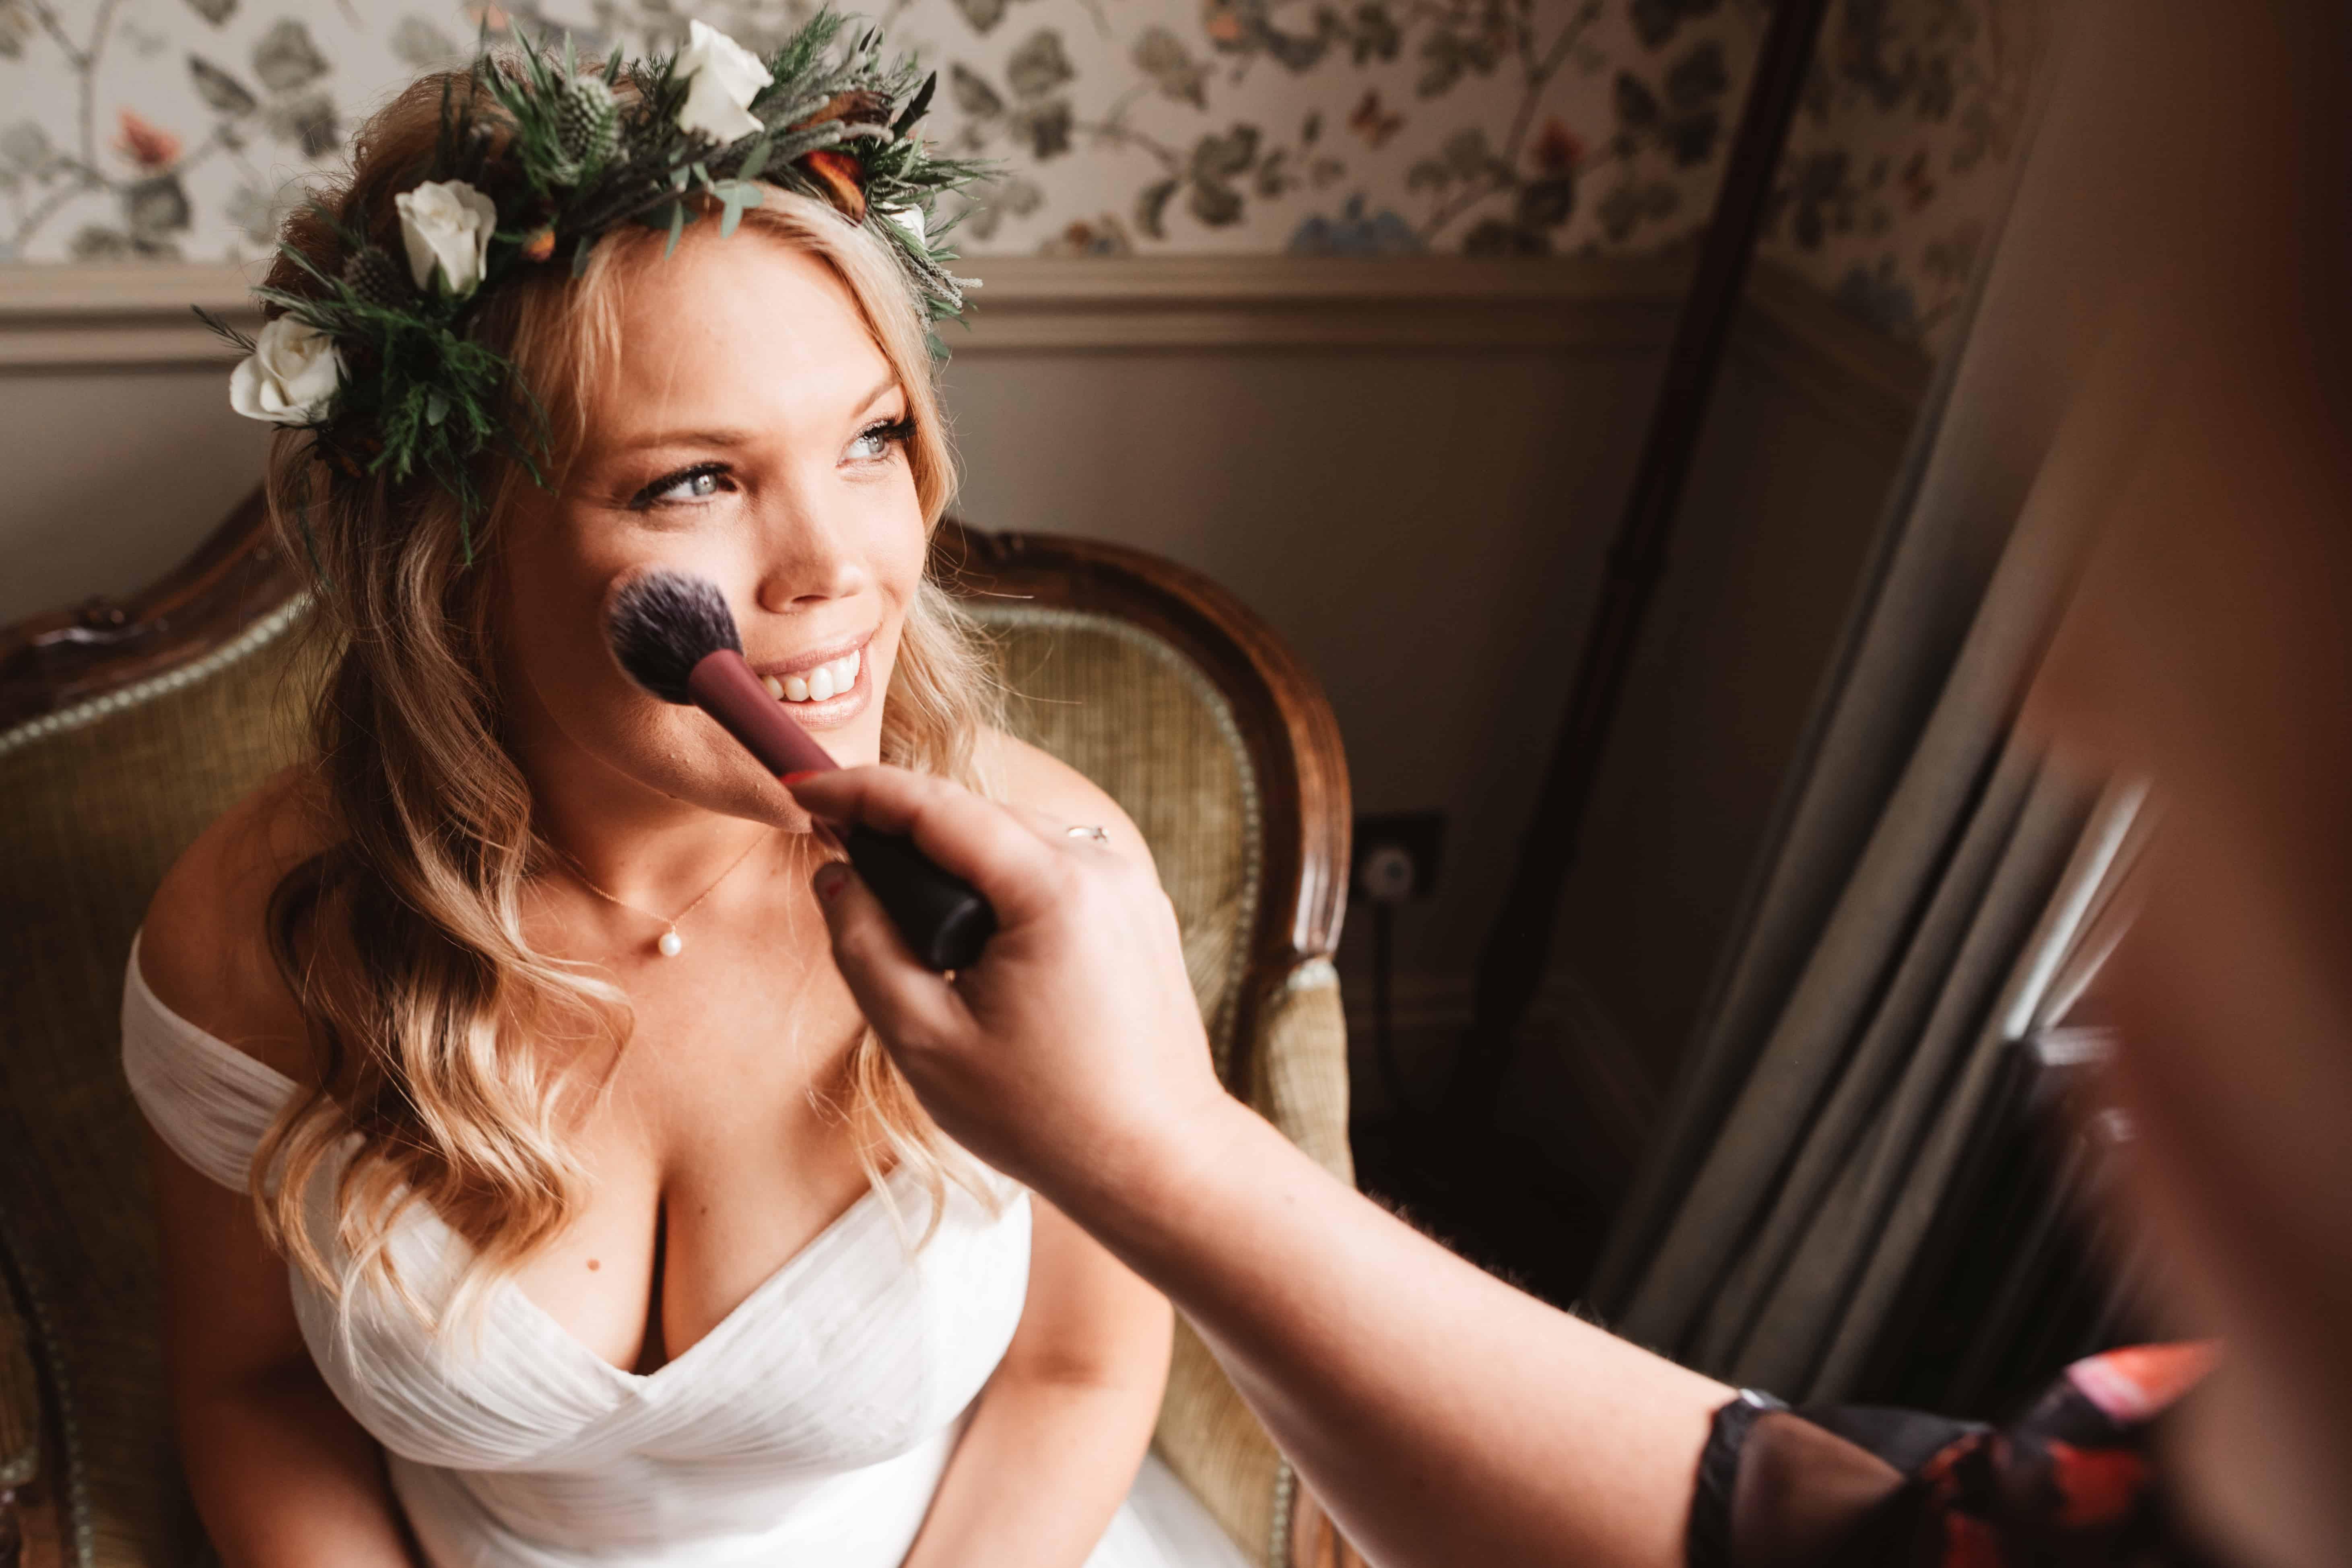 CAROLINE_AND_STU_KNIGHTON_HOUSE_WEDDING_-©Sam Cook_05